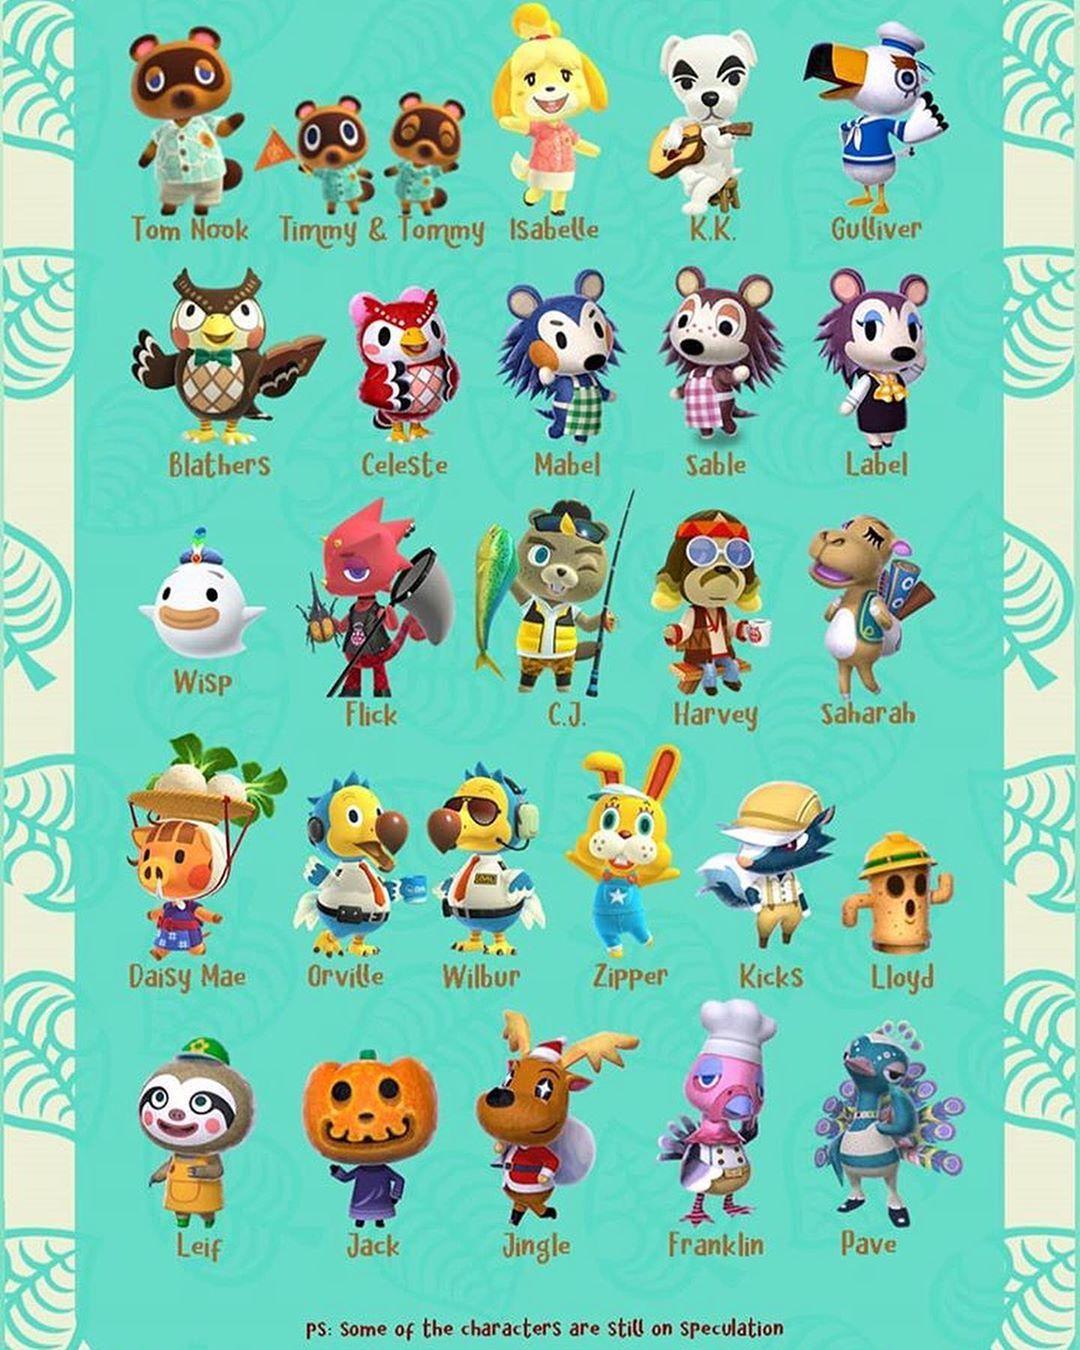 3 358 Likes 61 Comments Hi Astoria Acnh On Instagram Villager List Part 2 Missing Animal Crossing Animal Crossing Villagers Animal Crossing Game